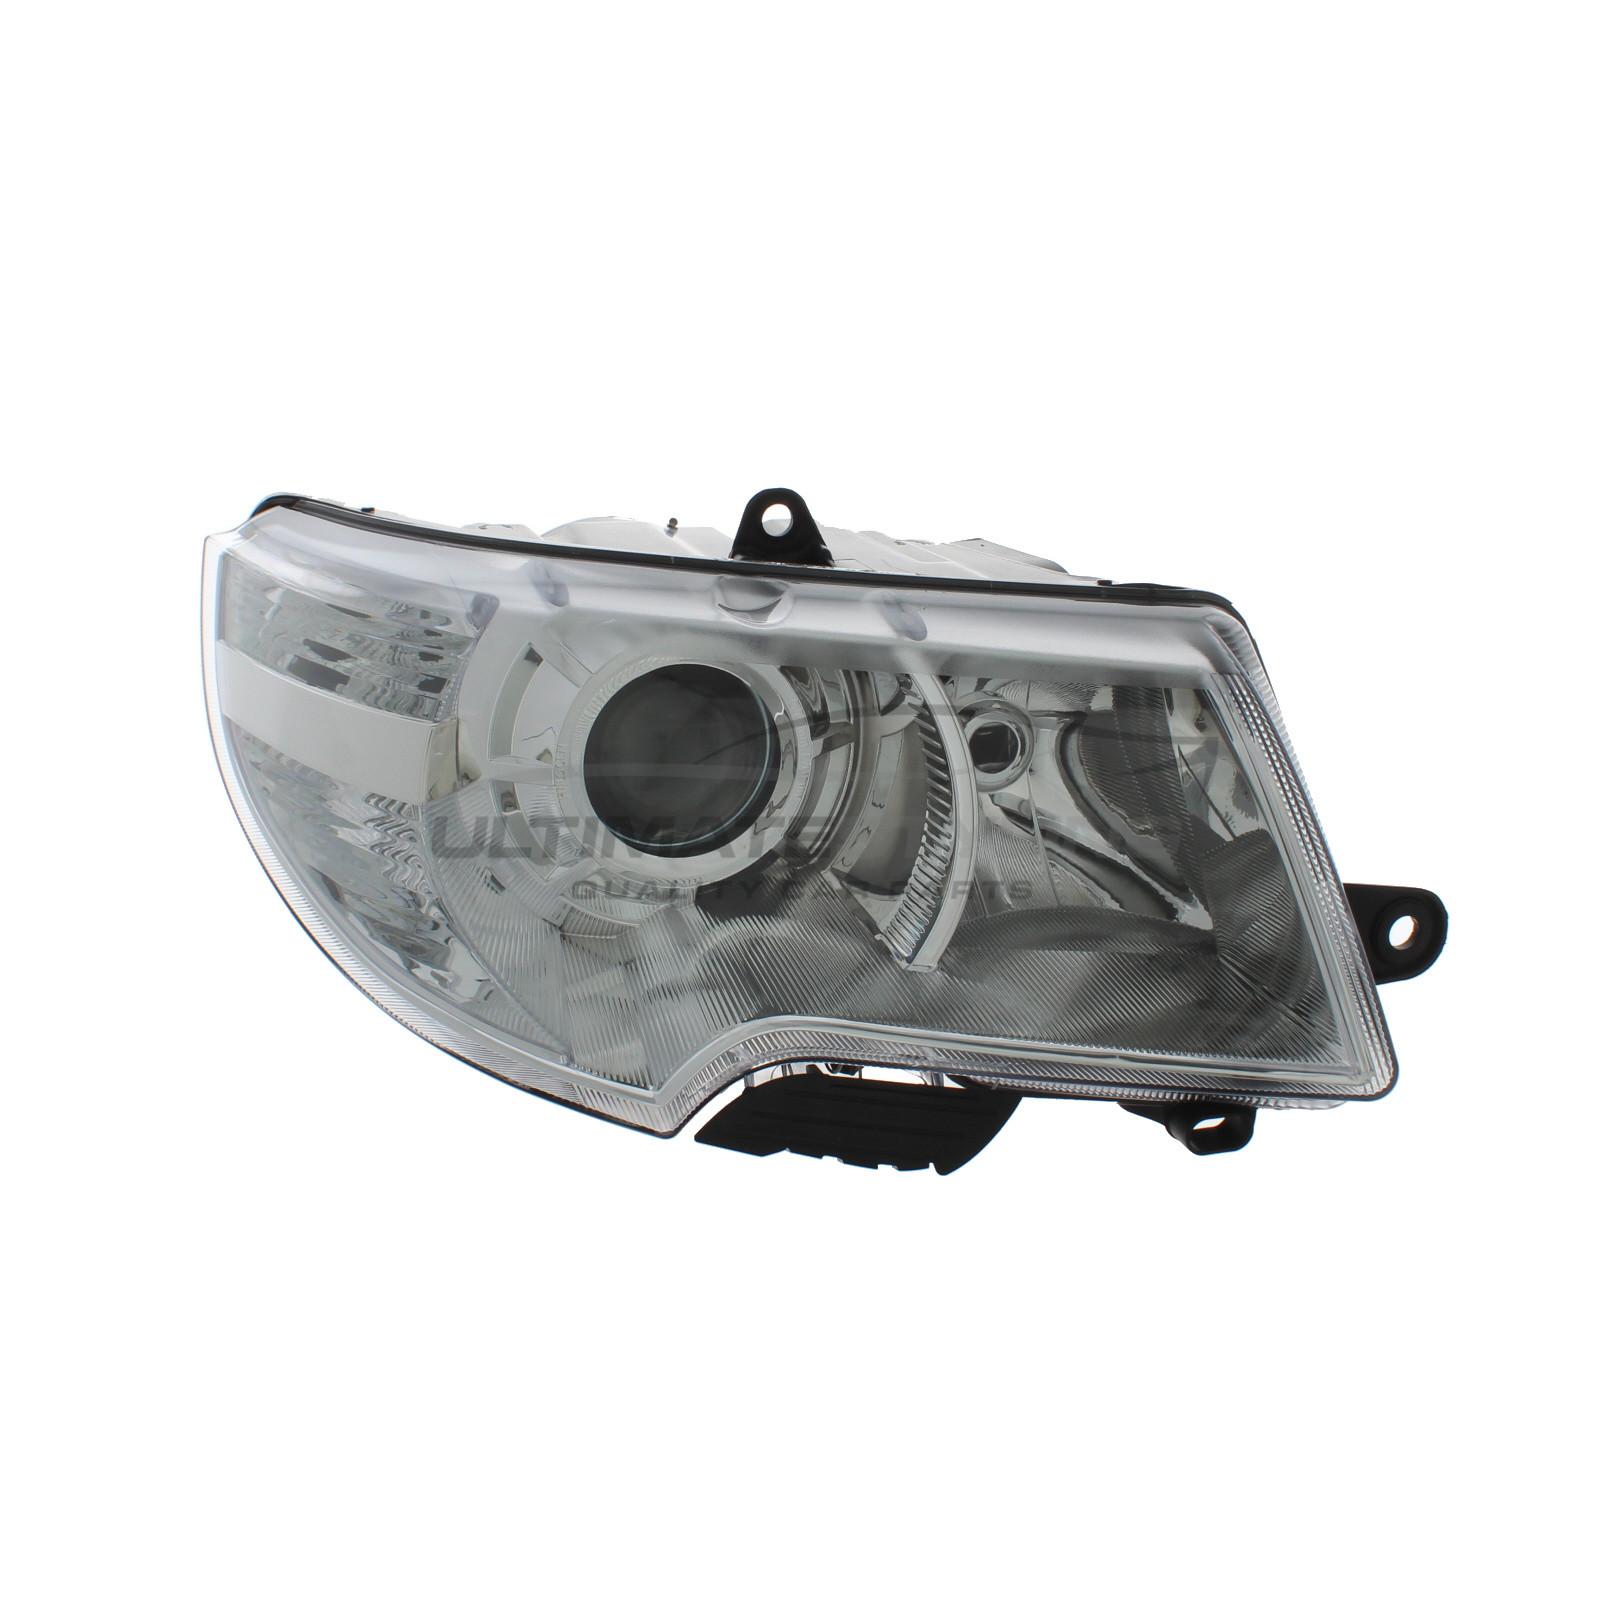 Skoda Superb Headlight Headlamp Drivers Side Rh Halogen